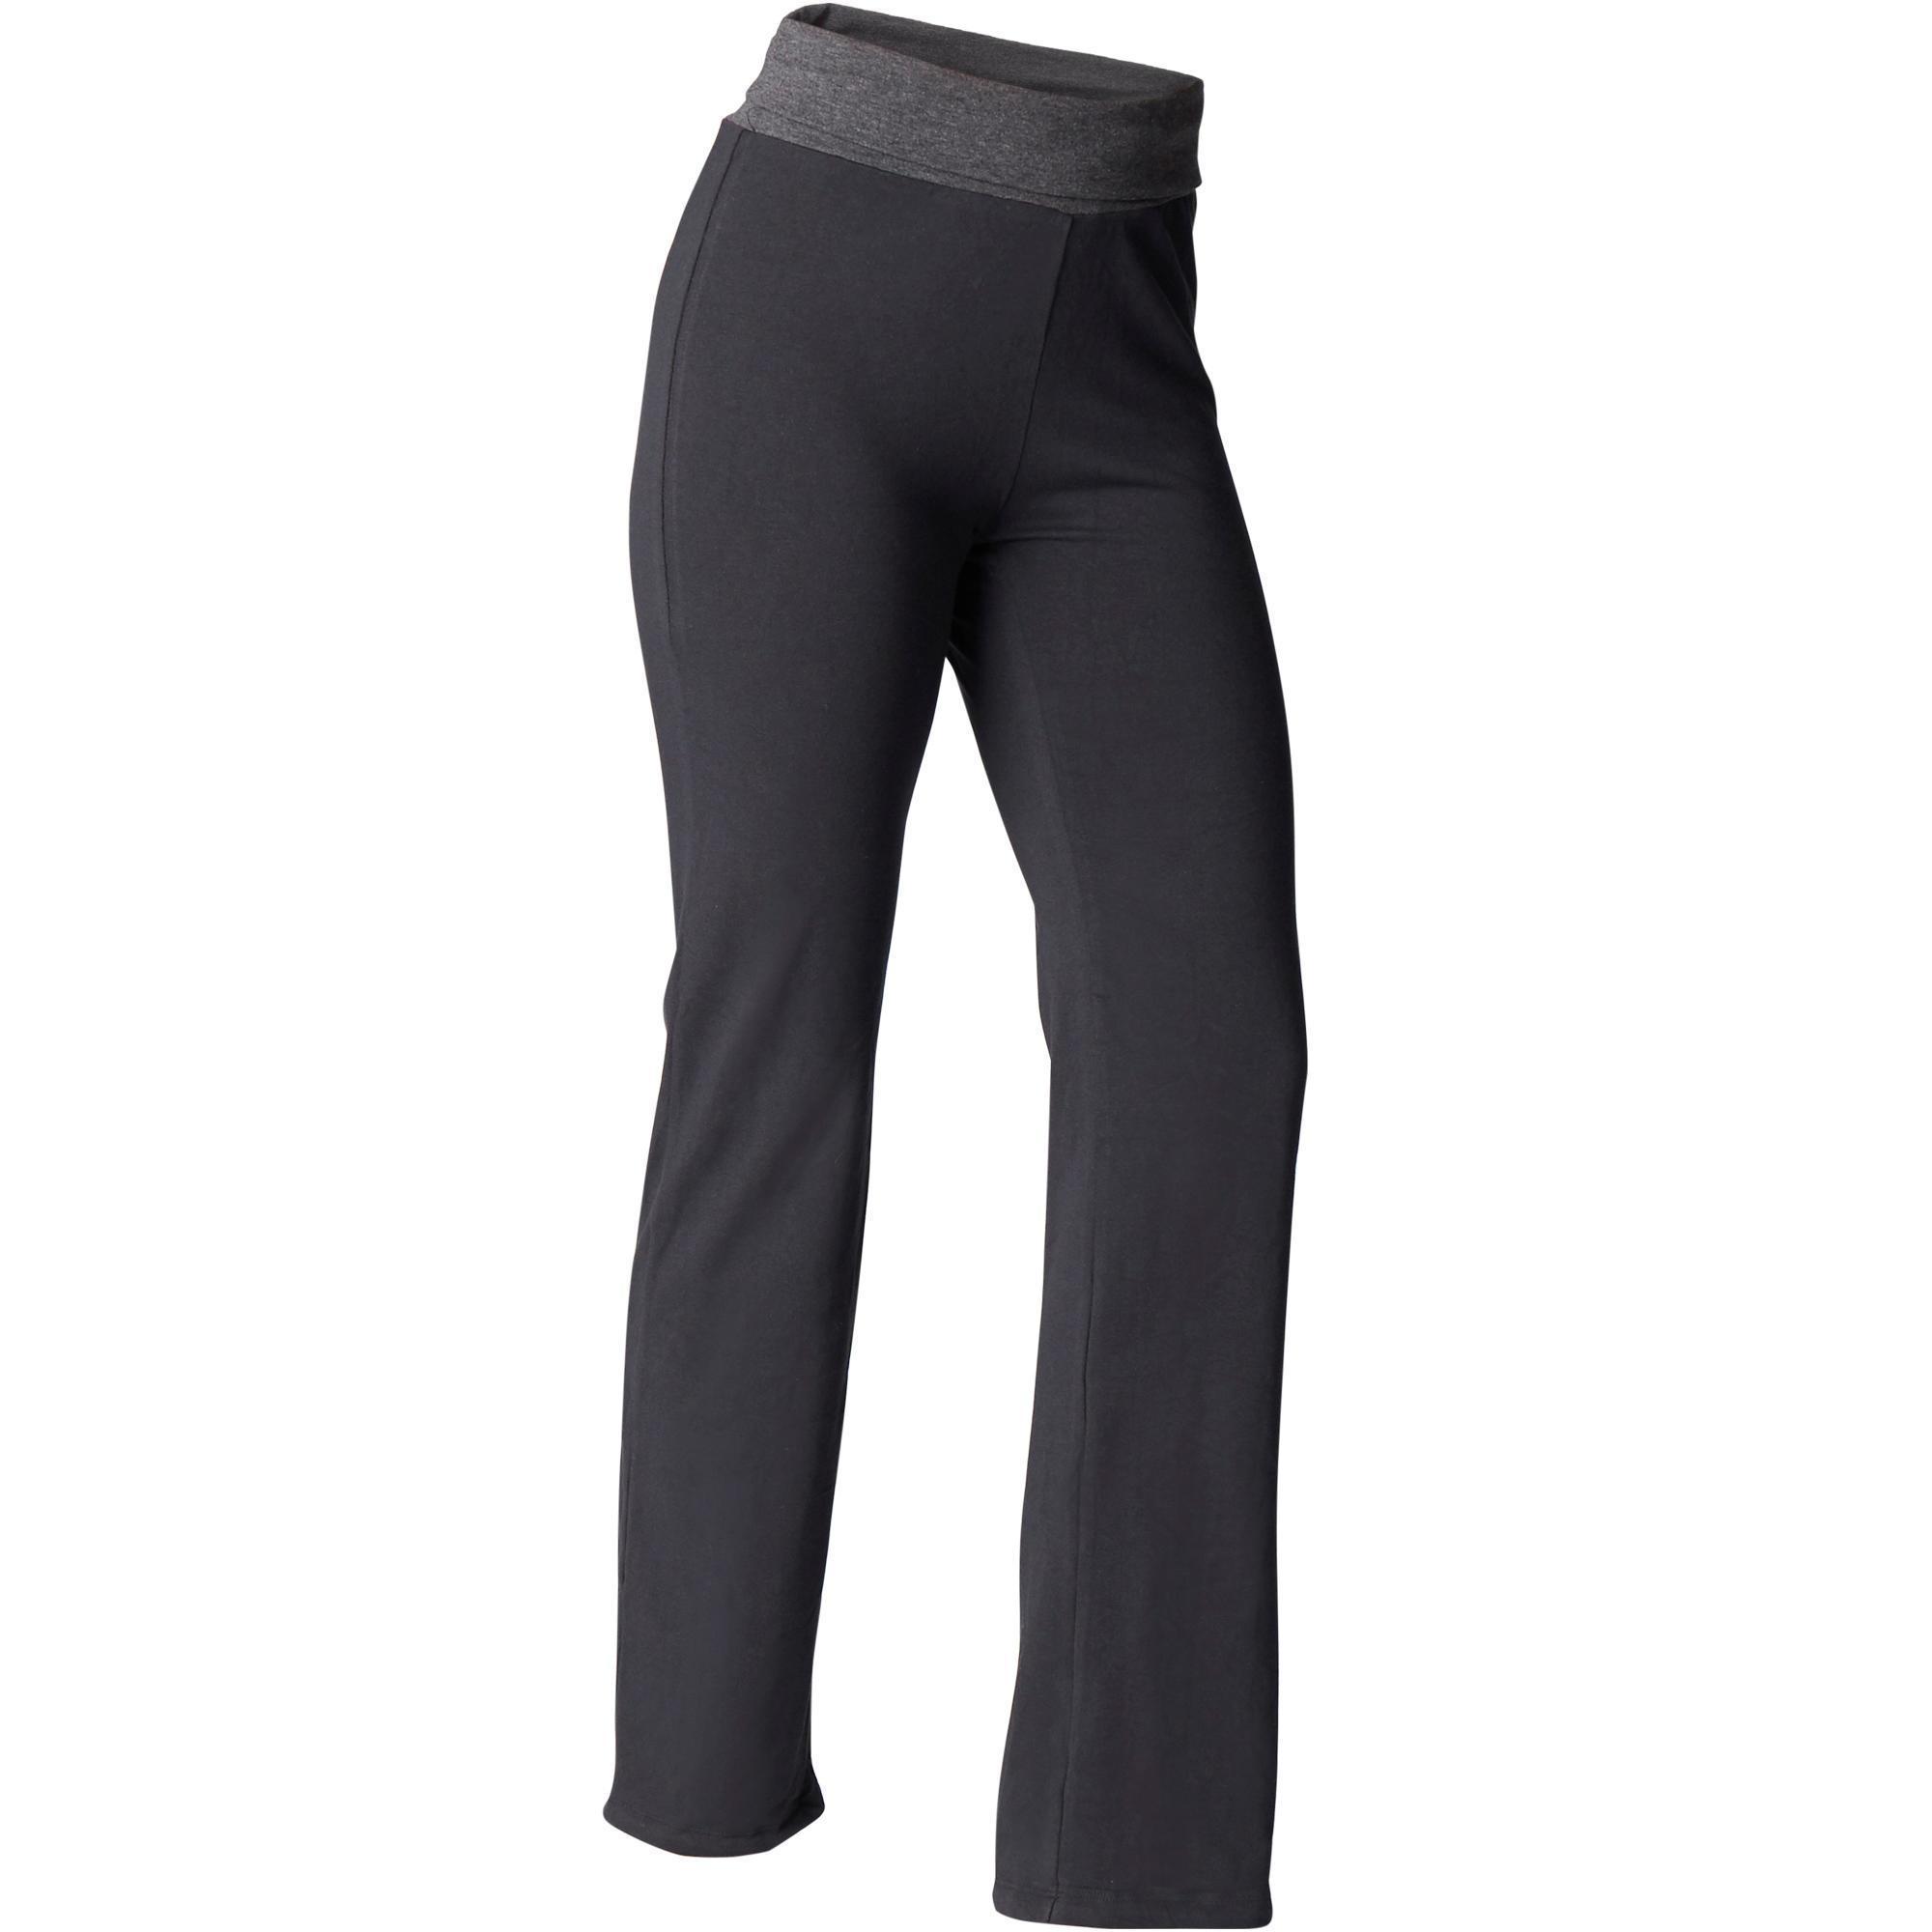 Yogahose sanftes Yoga aus Baumwolle aus biologischem Anbau Damen | Sportbekleidung > Sporthosen > Yogahosen | Domyos